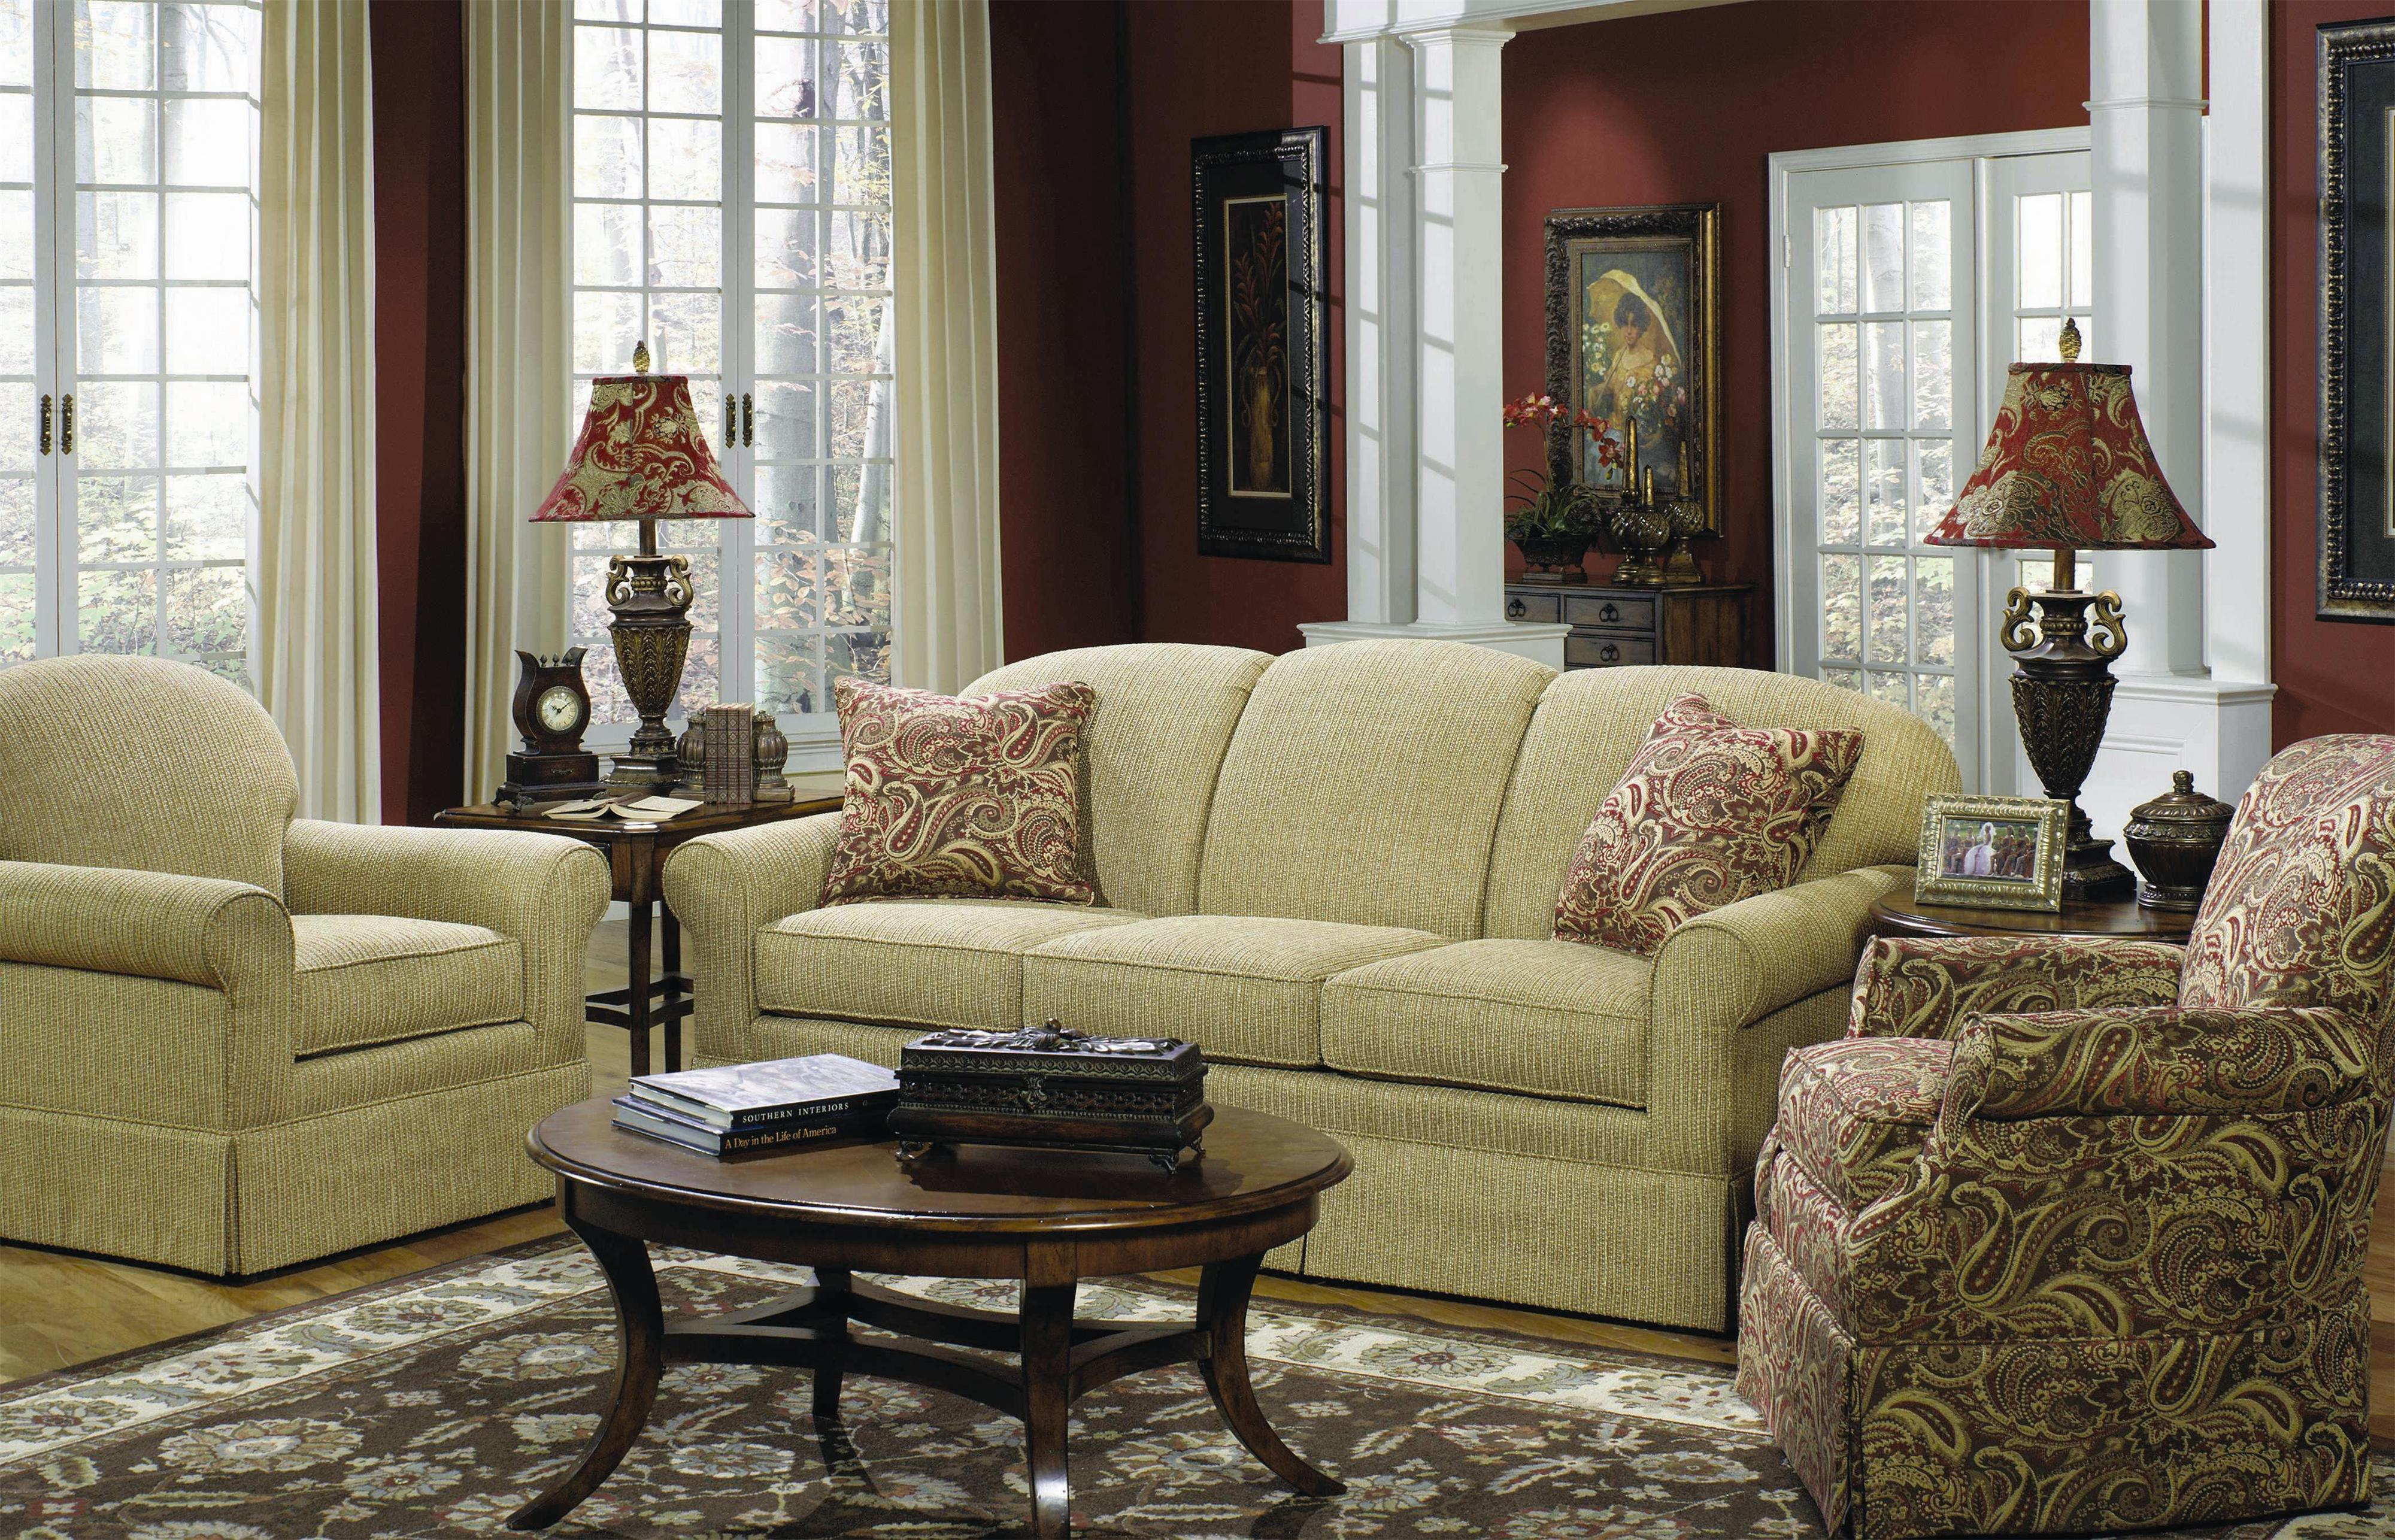 Craftmaster 9182 Stationary Living Room Group Olinde 39 S